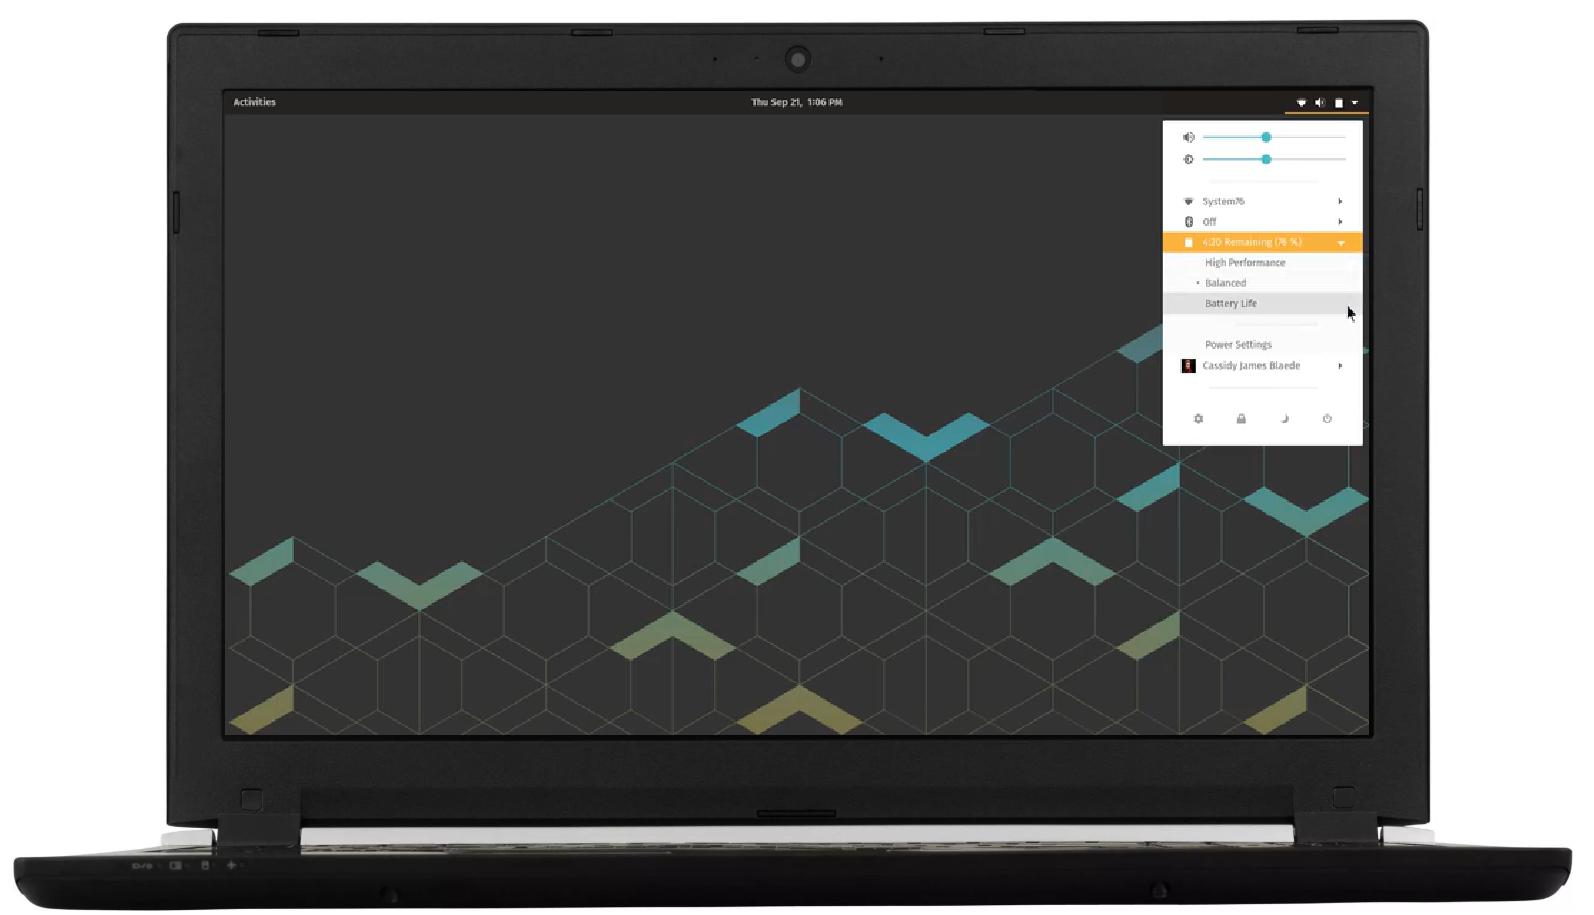 System 76 Oryx Pro: Linux-Notebook kommt mit Nvidia Turing und 16-Zoll-Panel - Oryx Pro (Bild: System76)